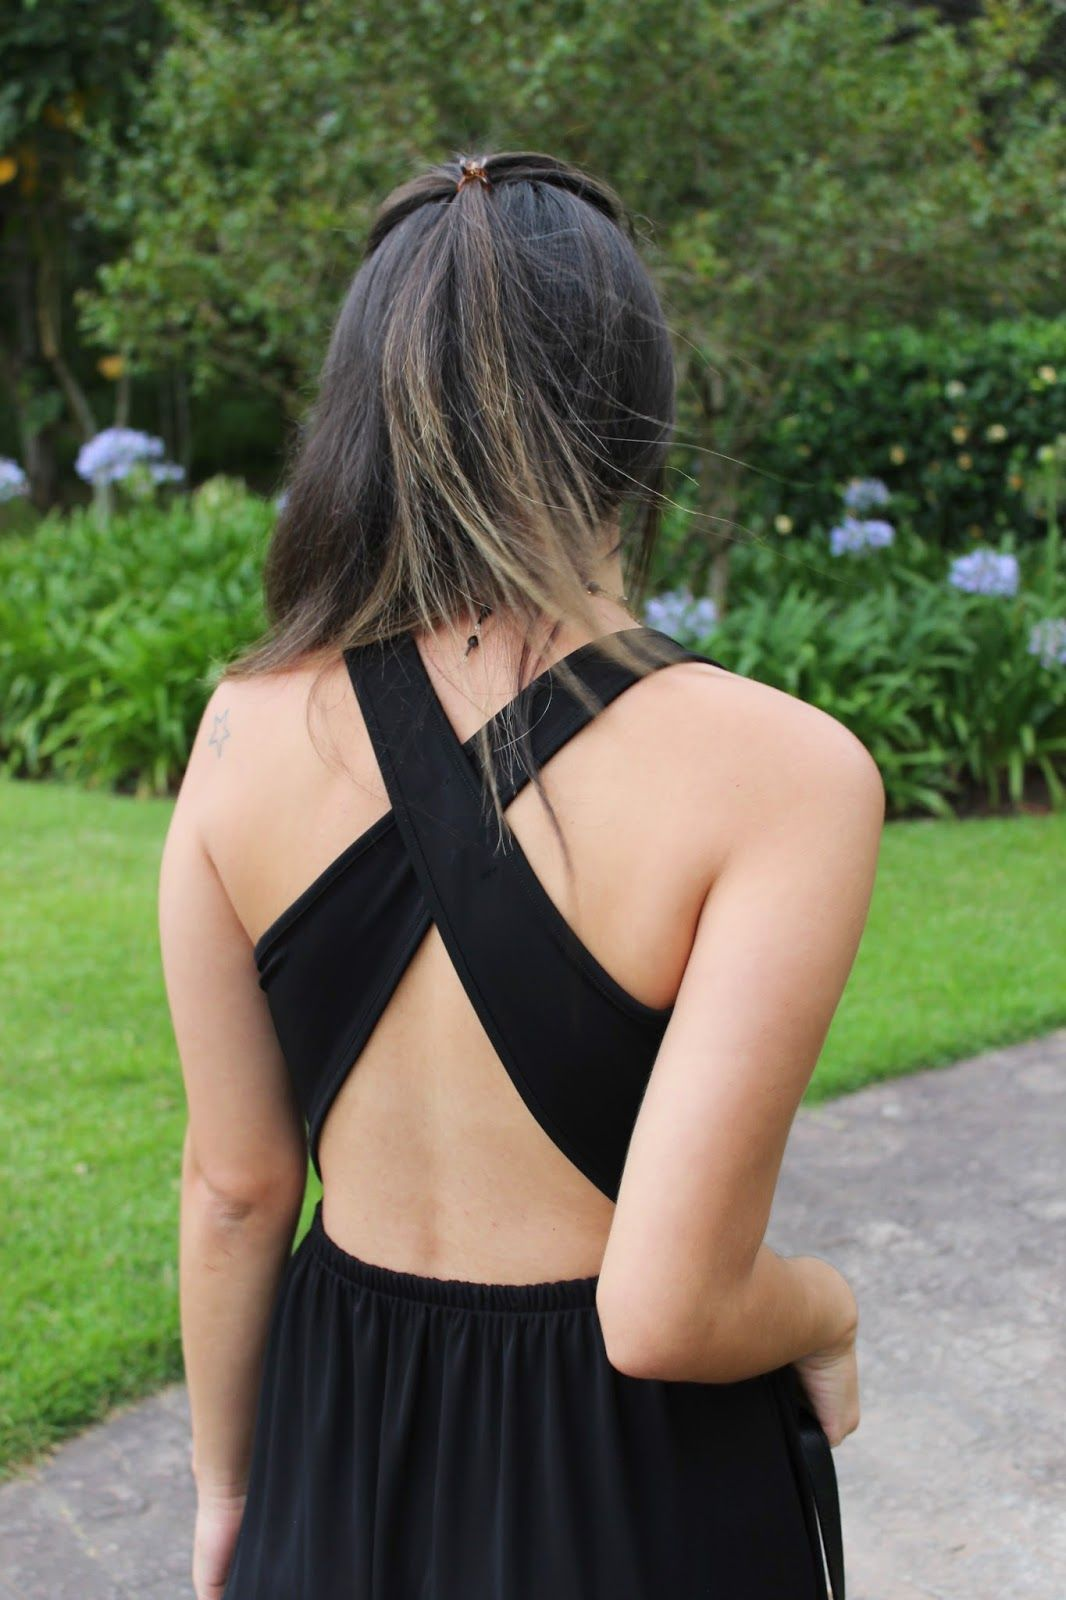 Nanda Pezzi - Details - Dress